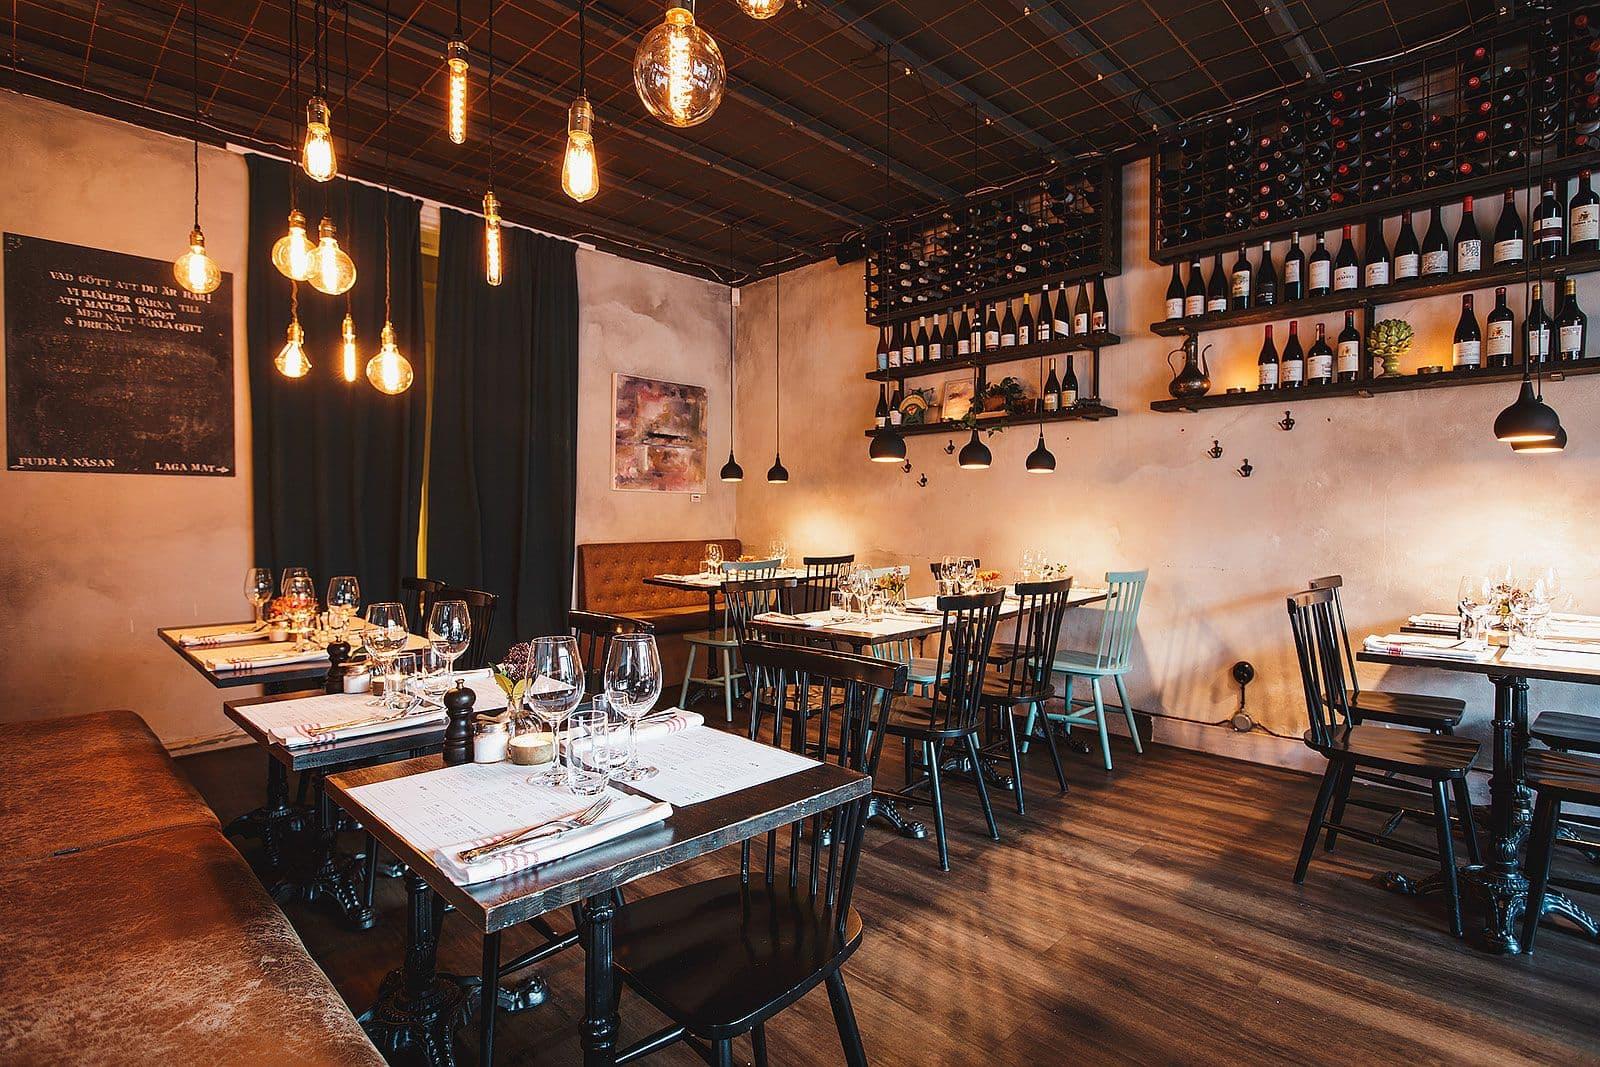 Hem Persisk restaurang Sophie Restaurang & Bar